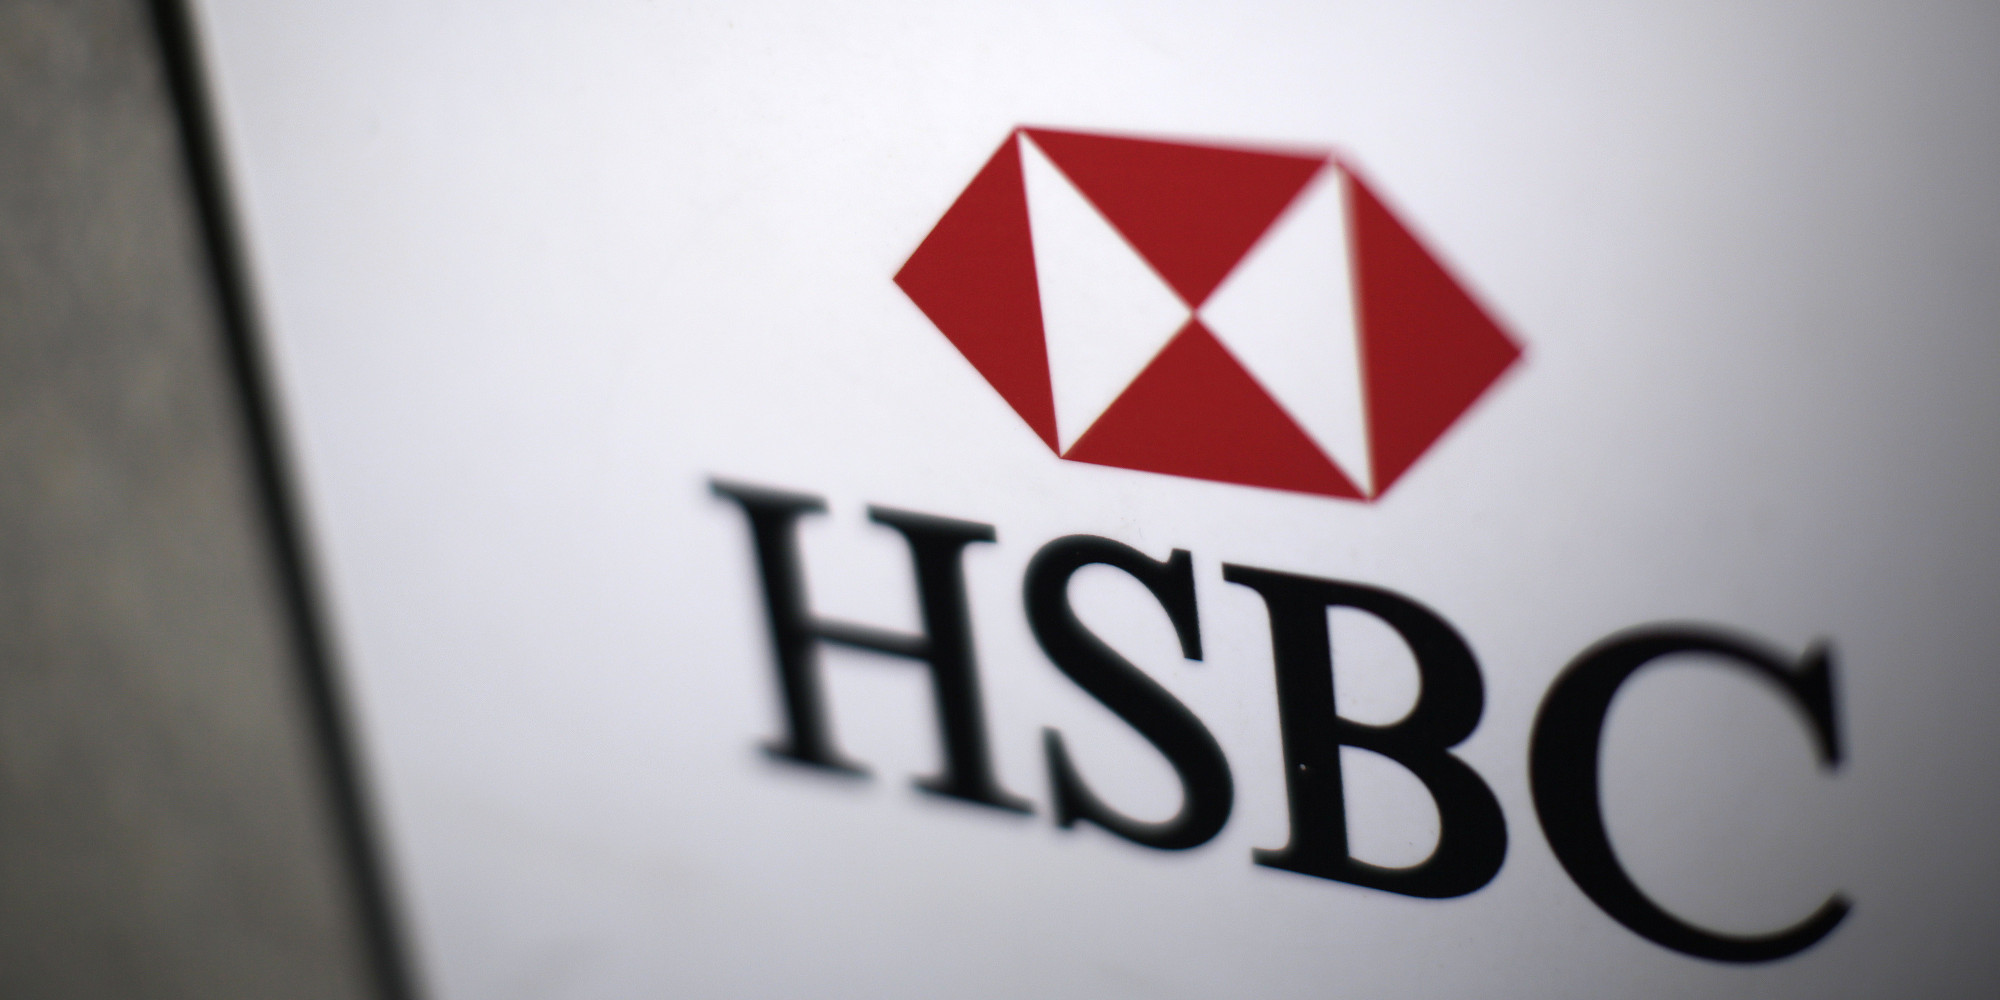 hsbc gets terrorist transactions fine huffpost swiss